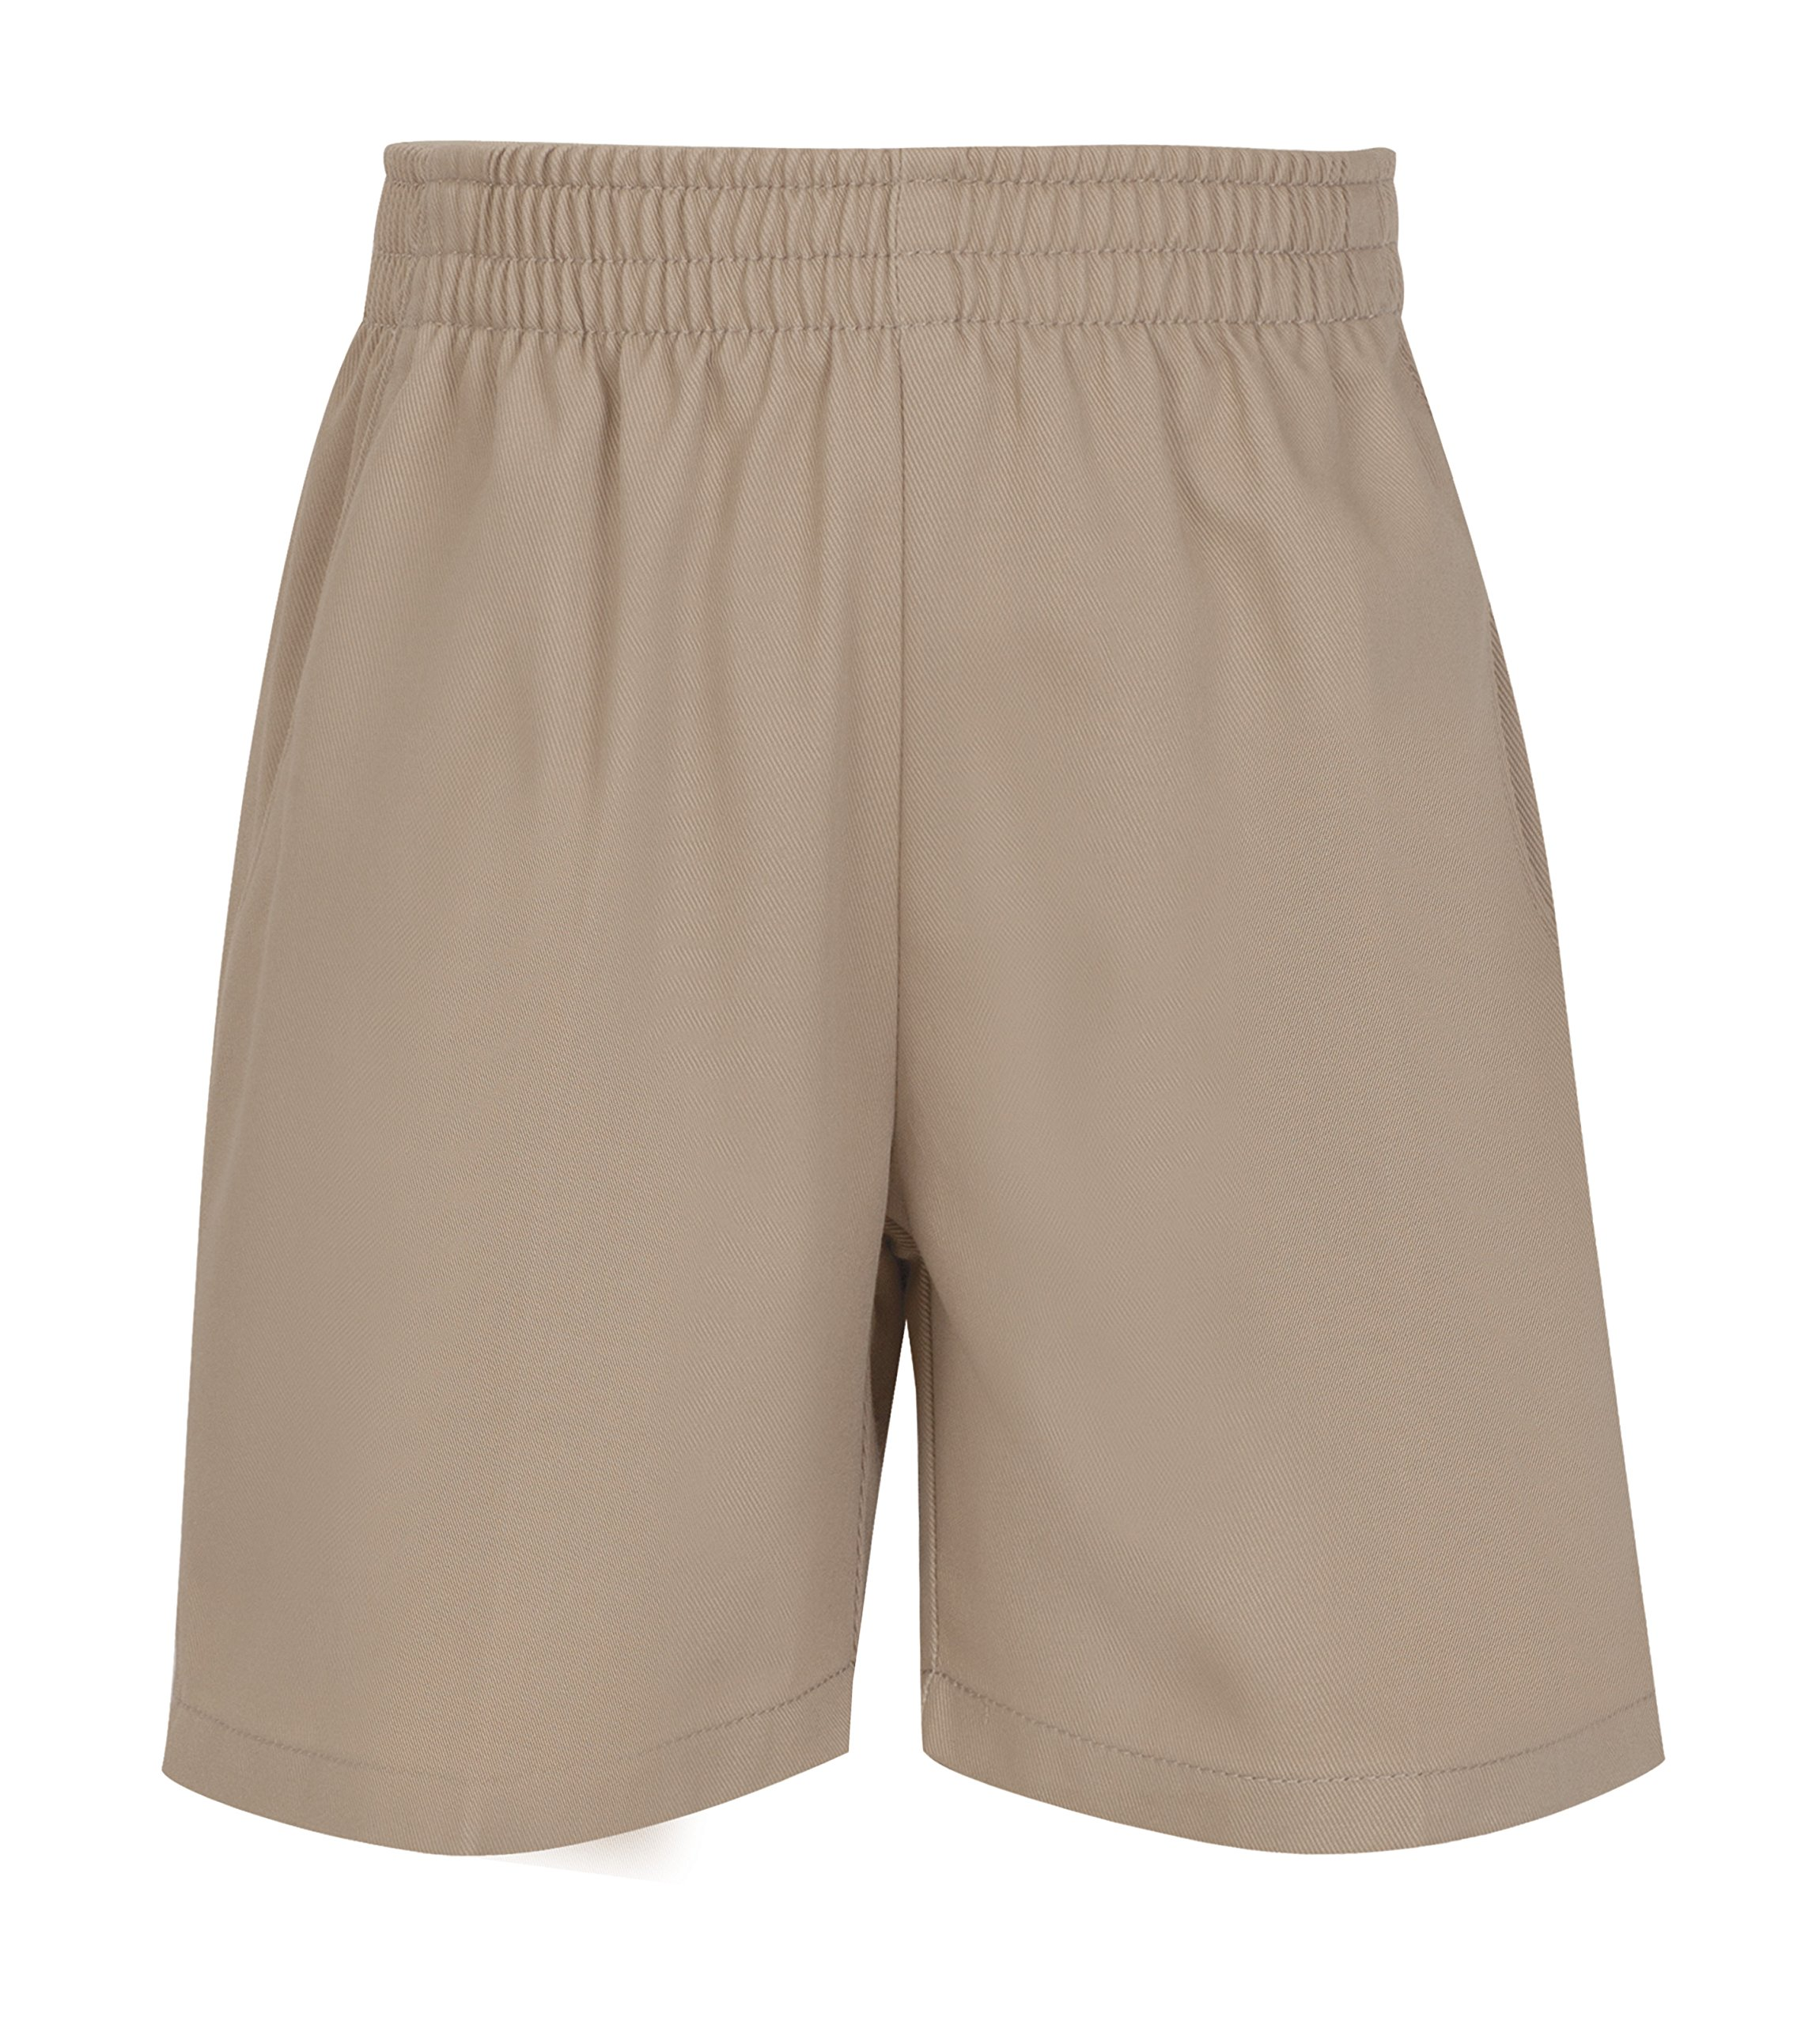 CLASSROOM Little Boys' Uniform Pull On Short, Khaki, 6